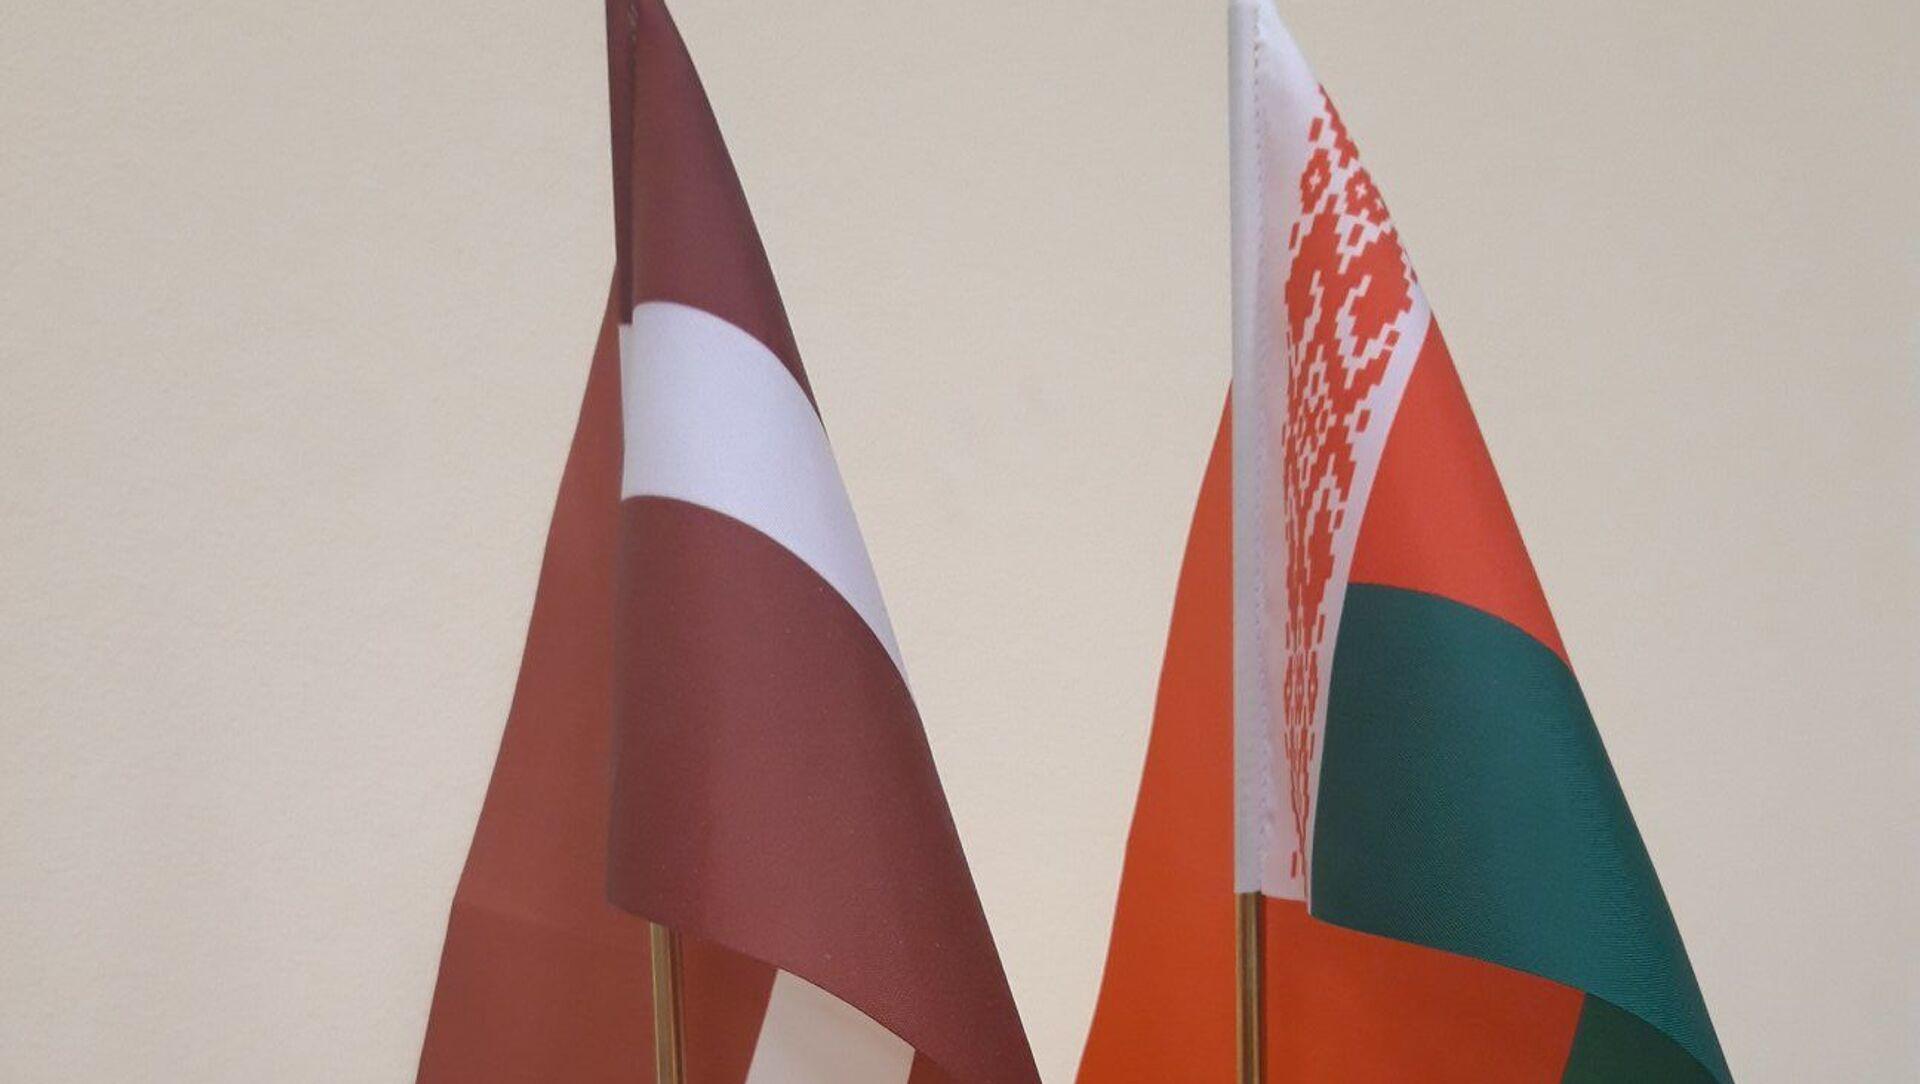 Флаги Беларуси и Латвии - Sputnik Беларусь, 1920, 24.05.2021